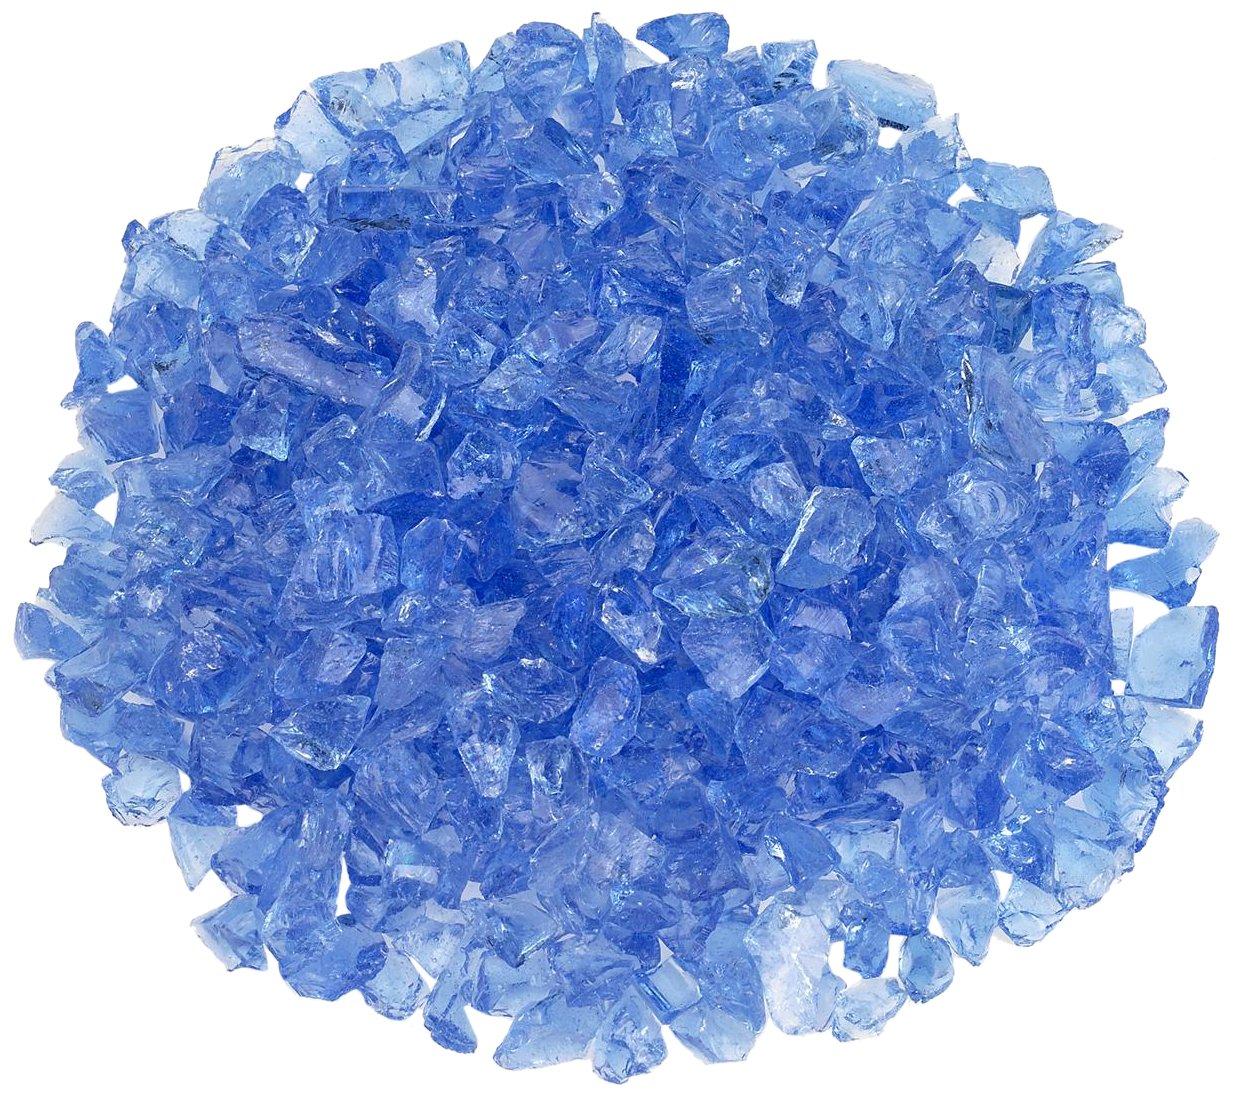 American Fireglass Light Blue Recycled Fire Pit Glass - Small (12-18Mm), 20 lb. Bag